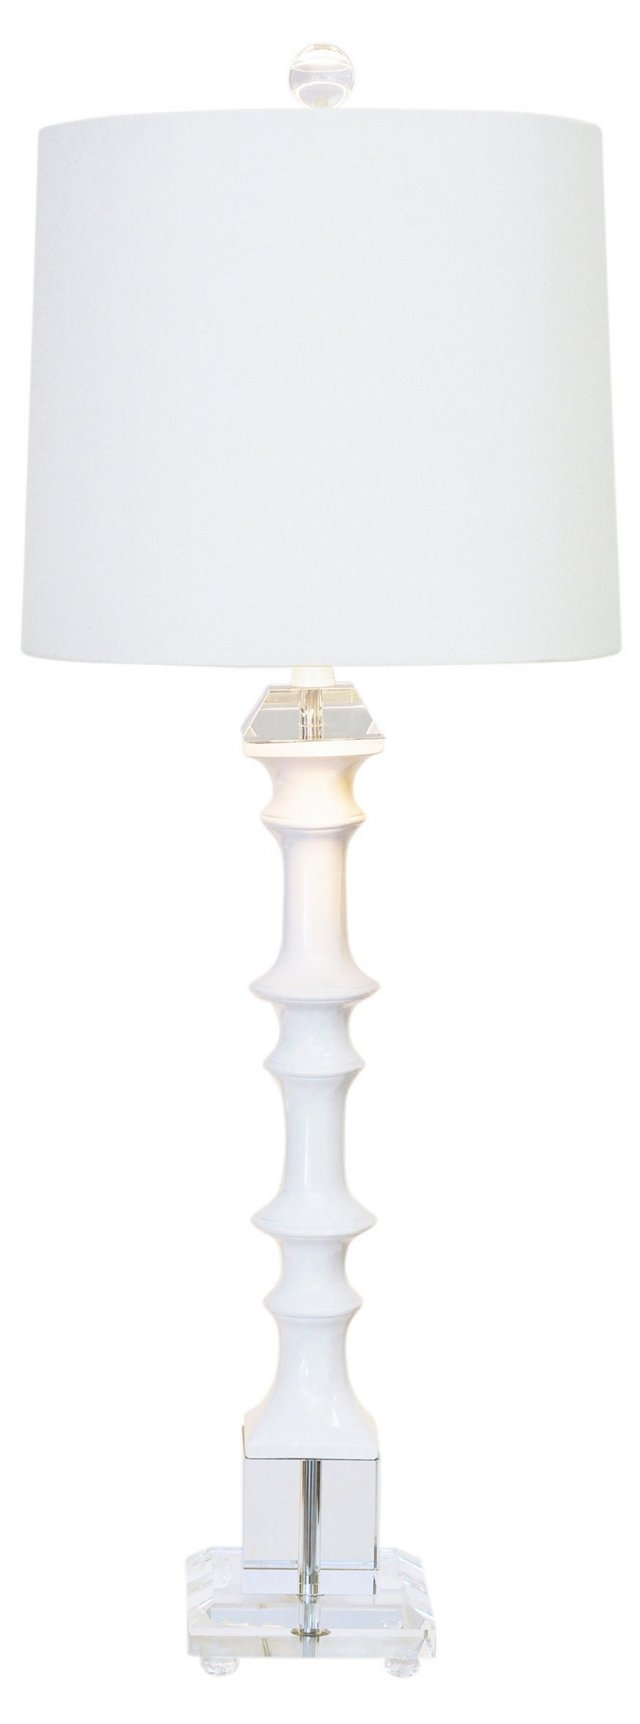 Peninsula Buffet Table Lamp, White Gloss